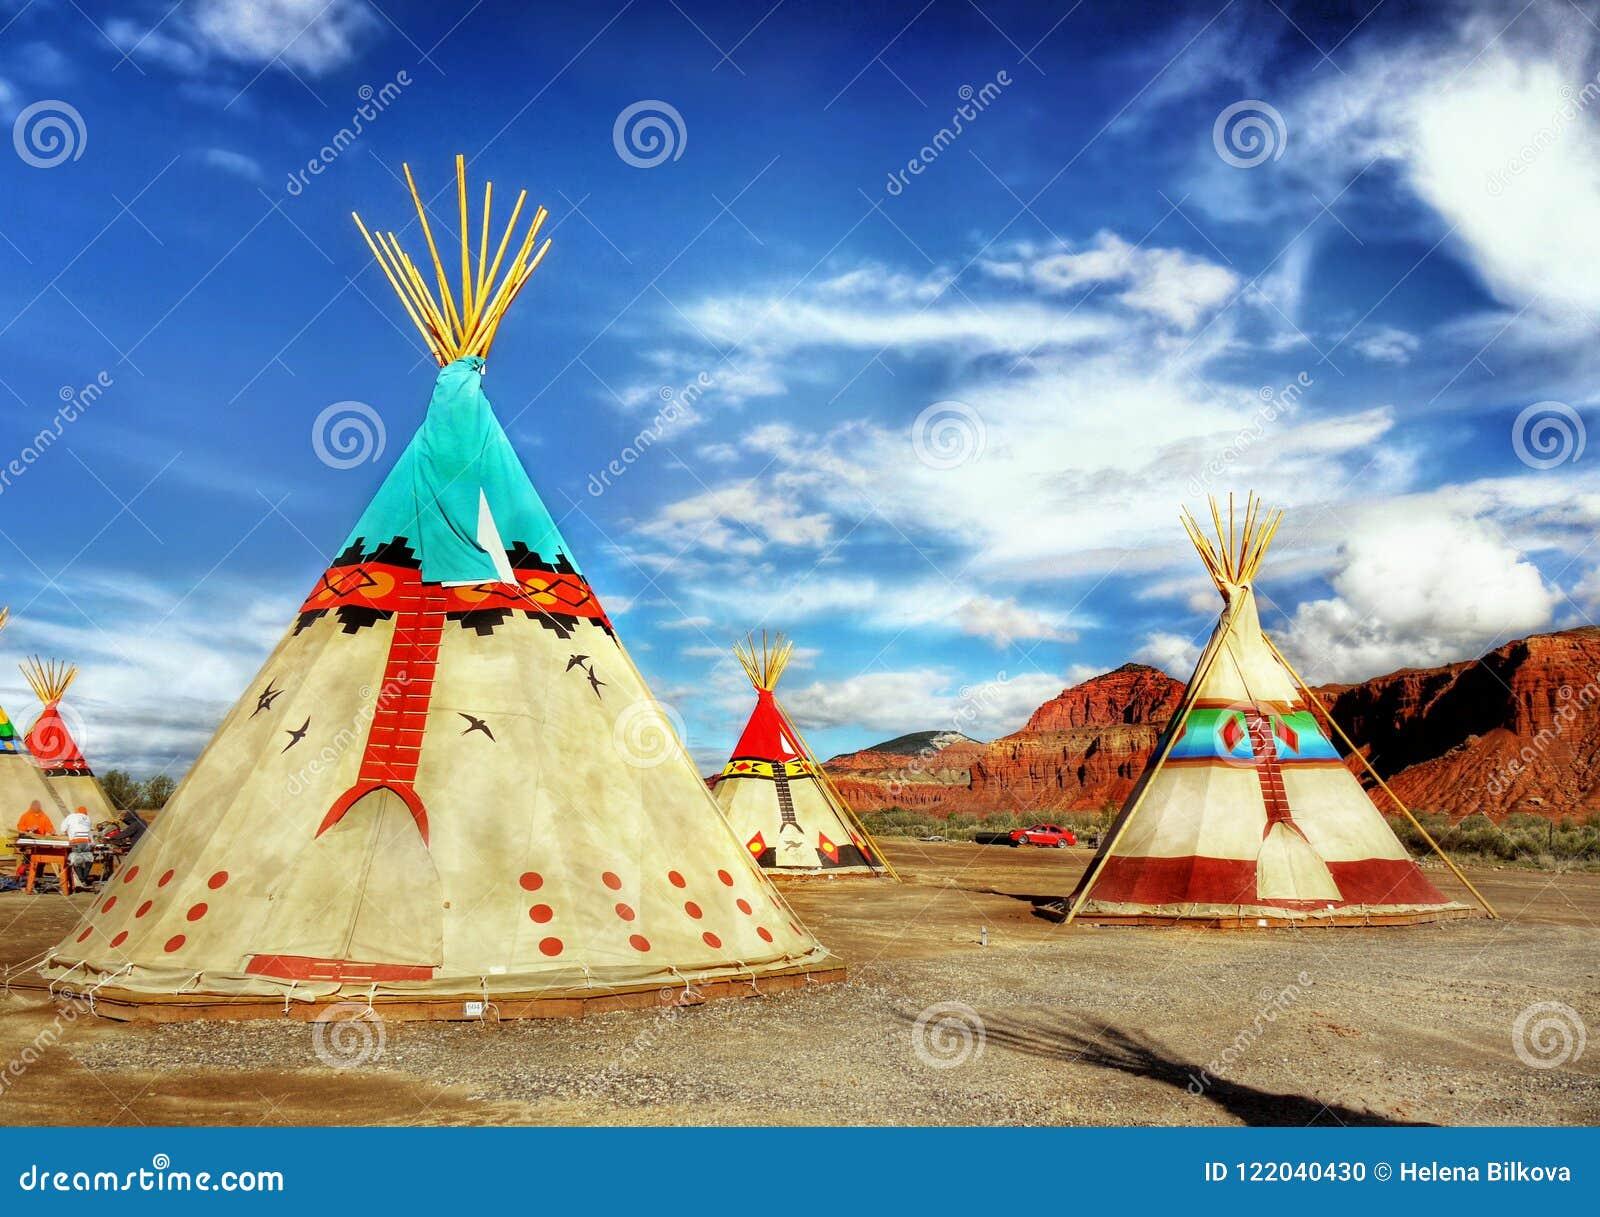 Native American Indian Tents Teepee